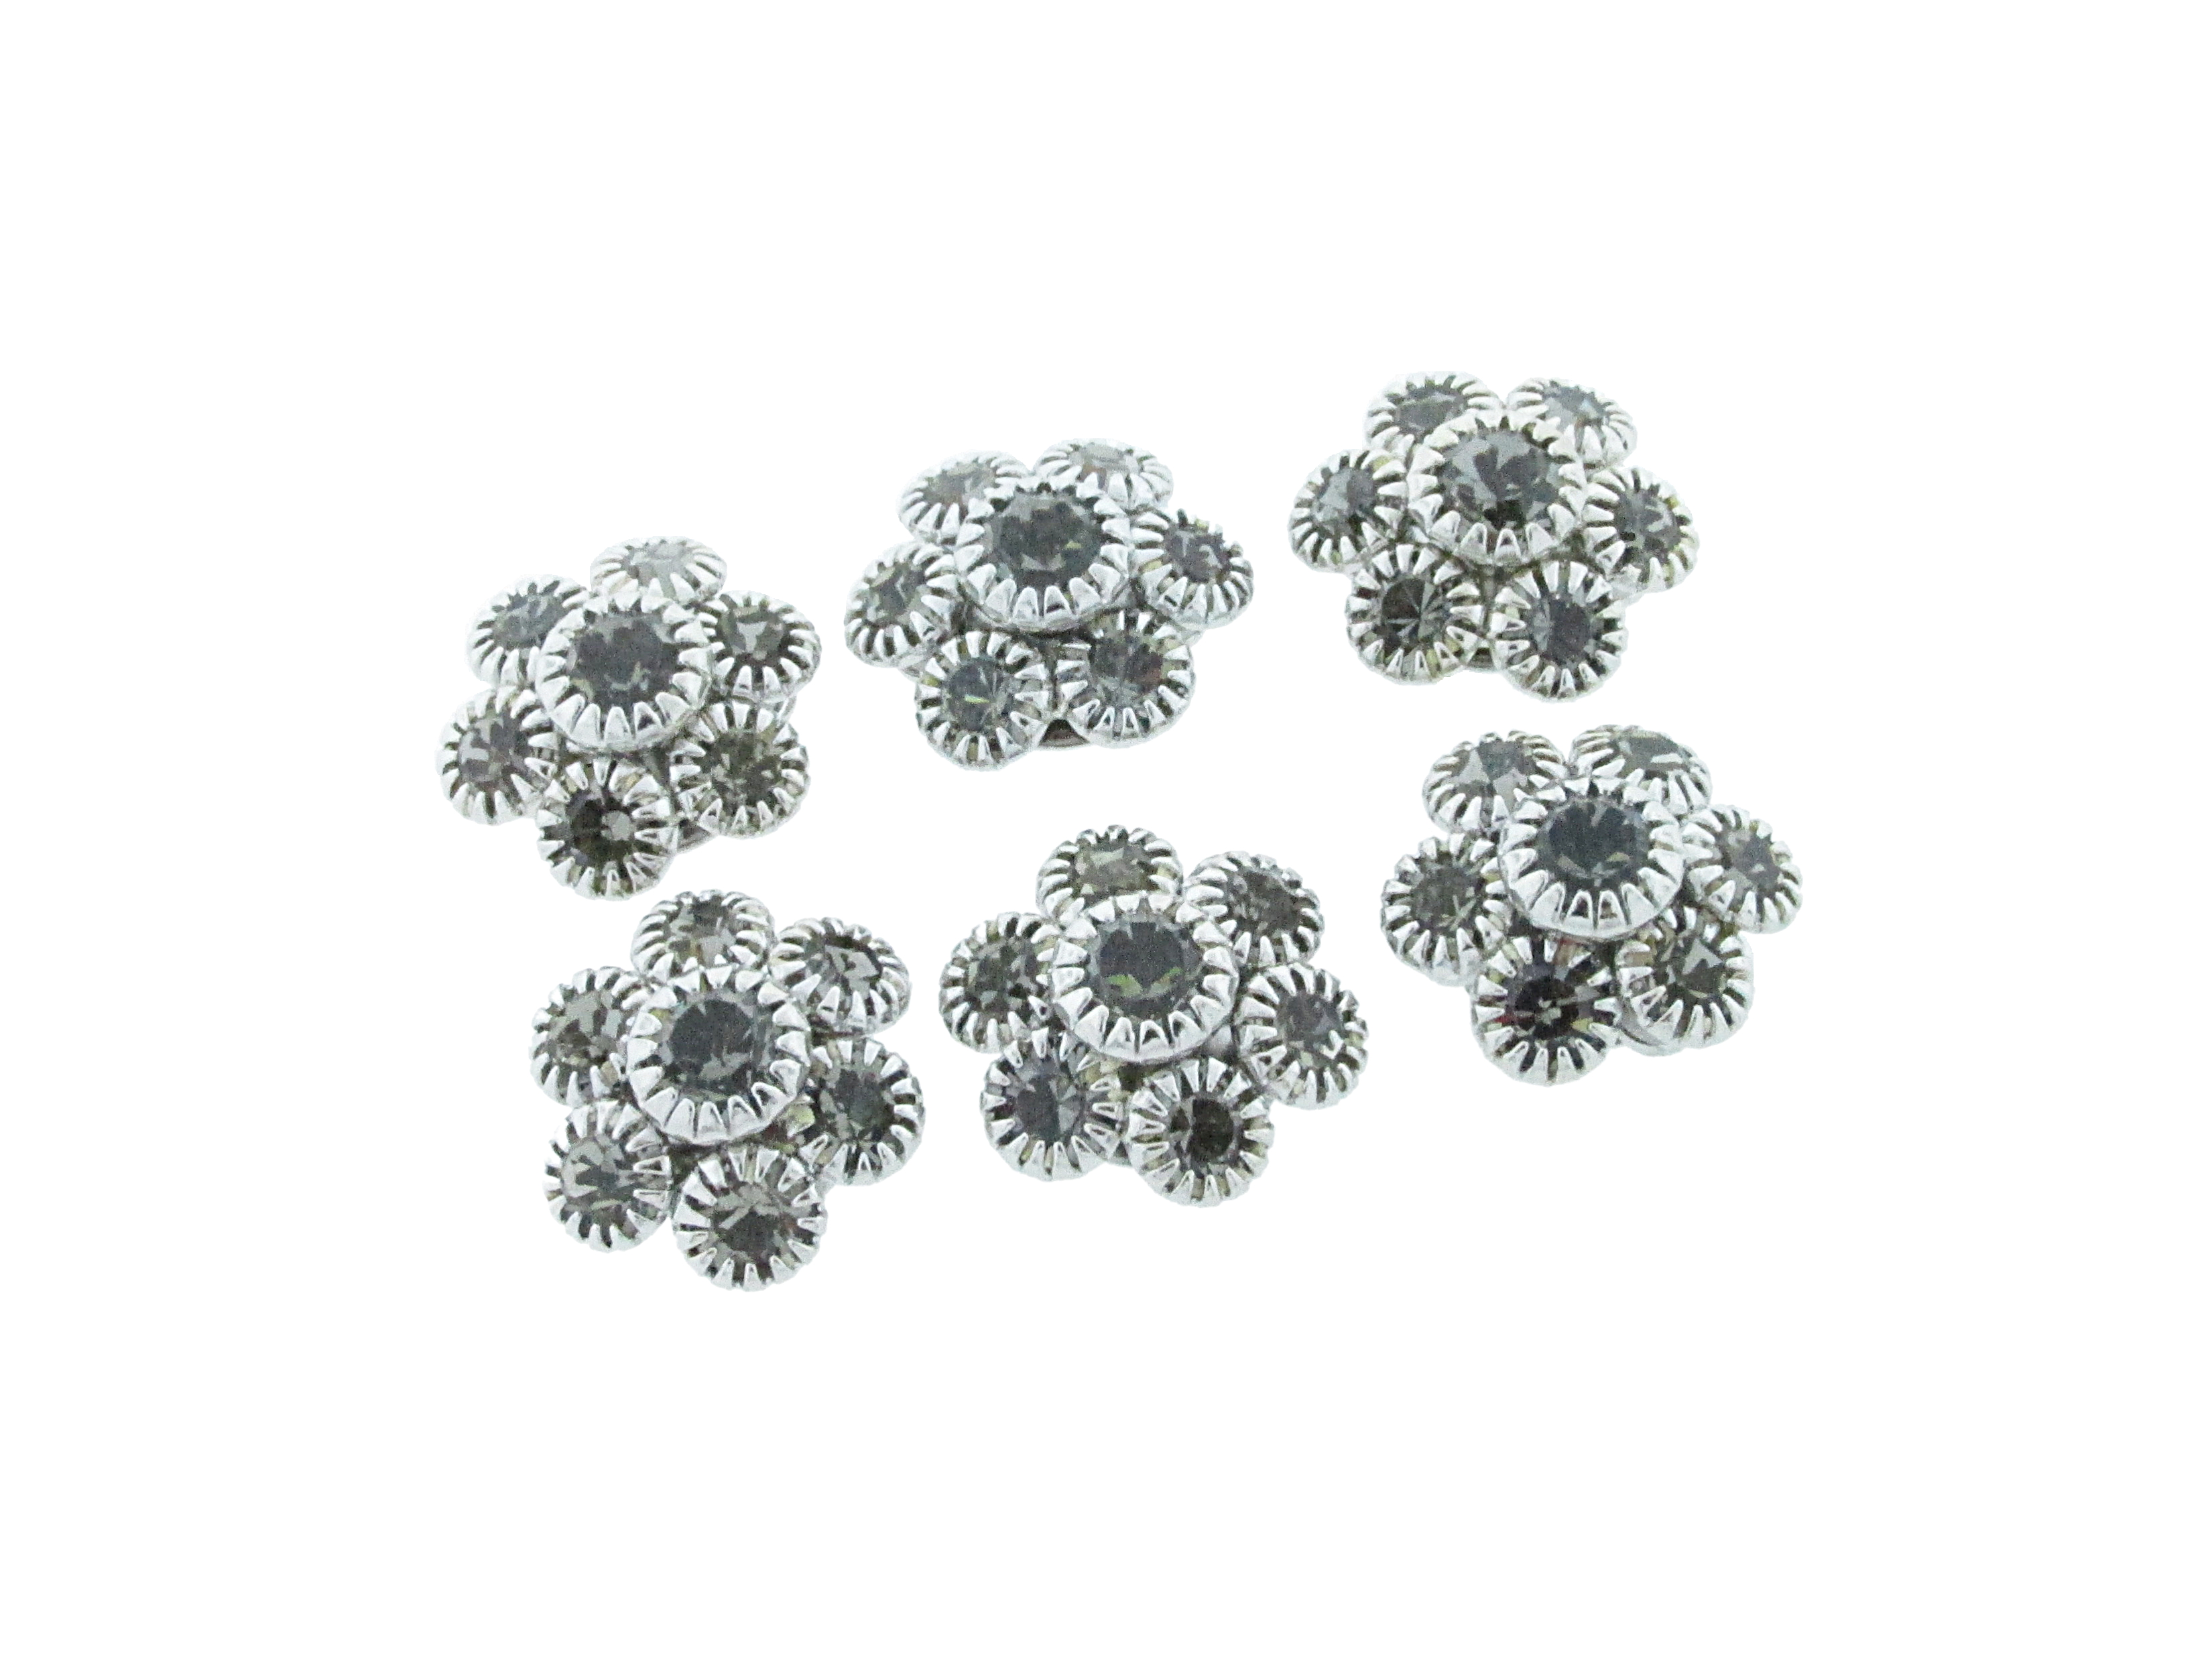 14mmblackdiamond.jpg